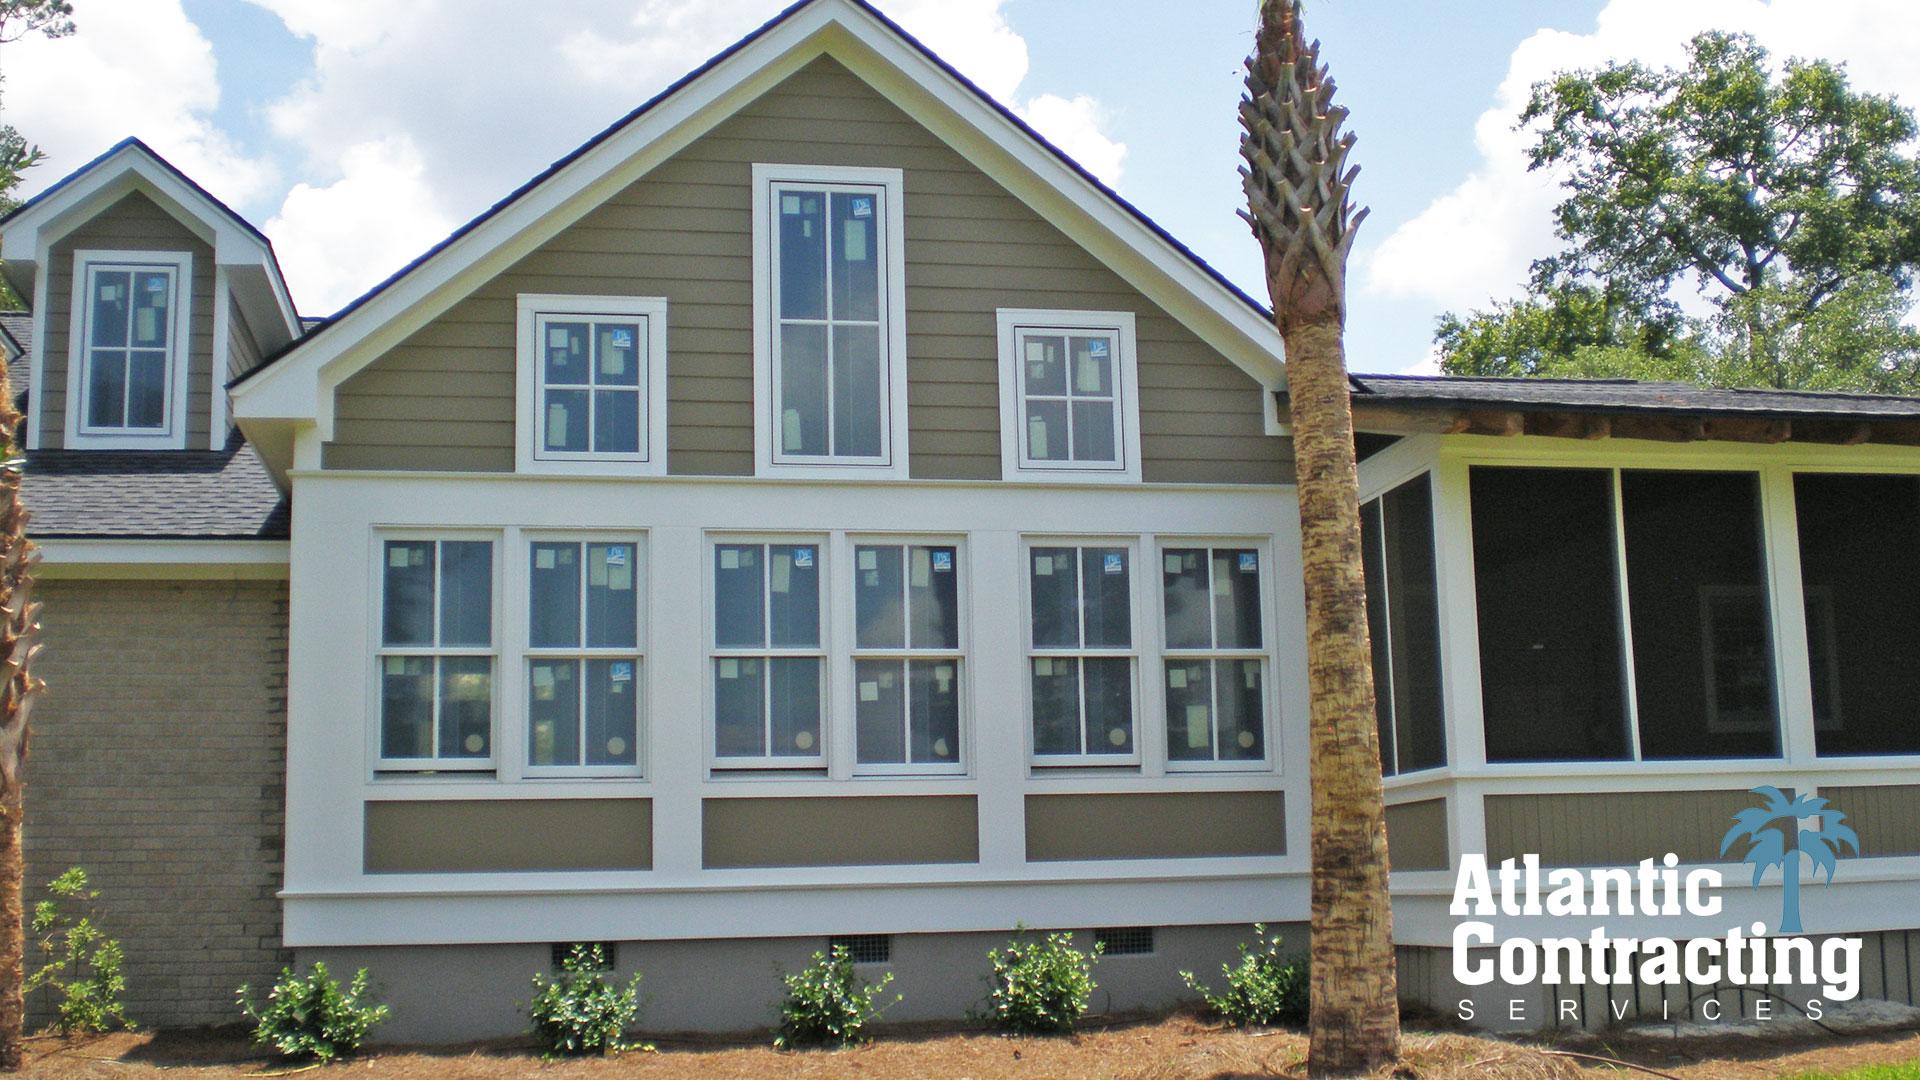 Home Improvement Contractors Atlantic Contracting